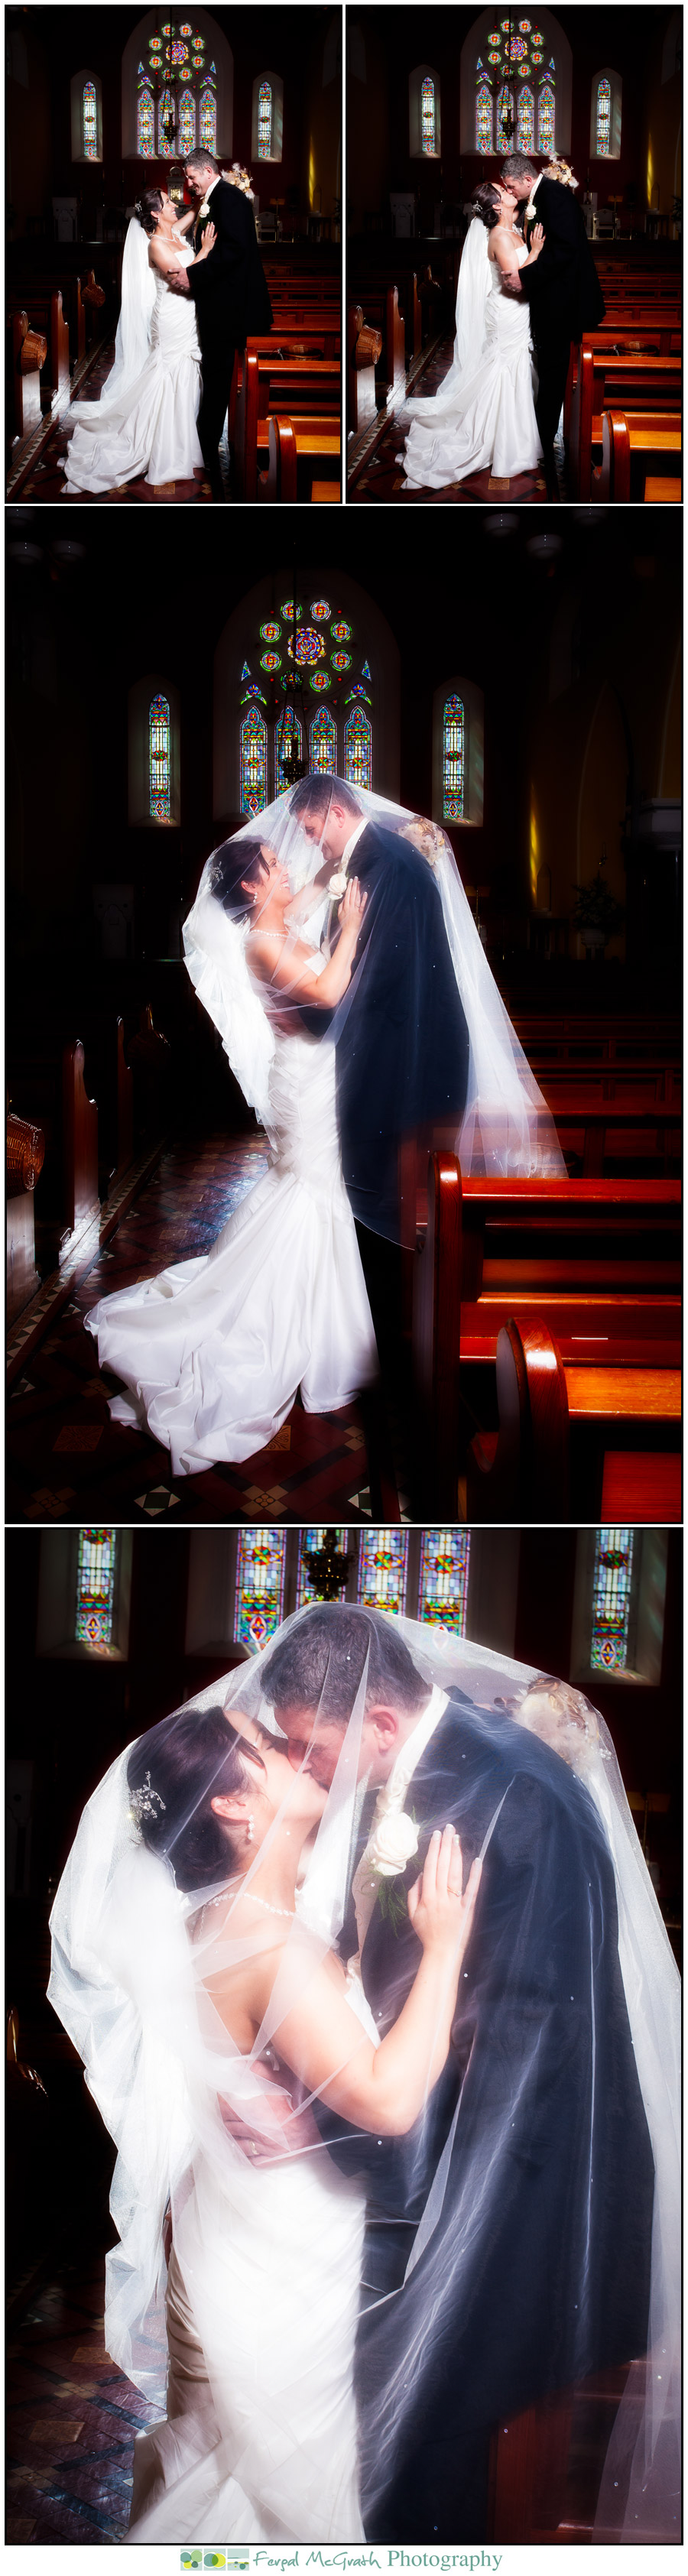 breda paul wedding photos great northern hotel bundoran 7